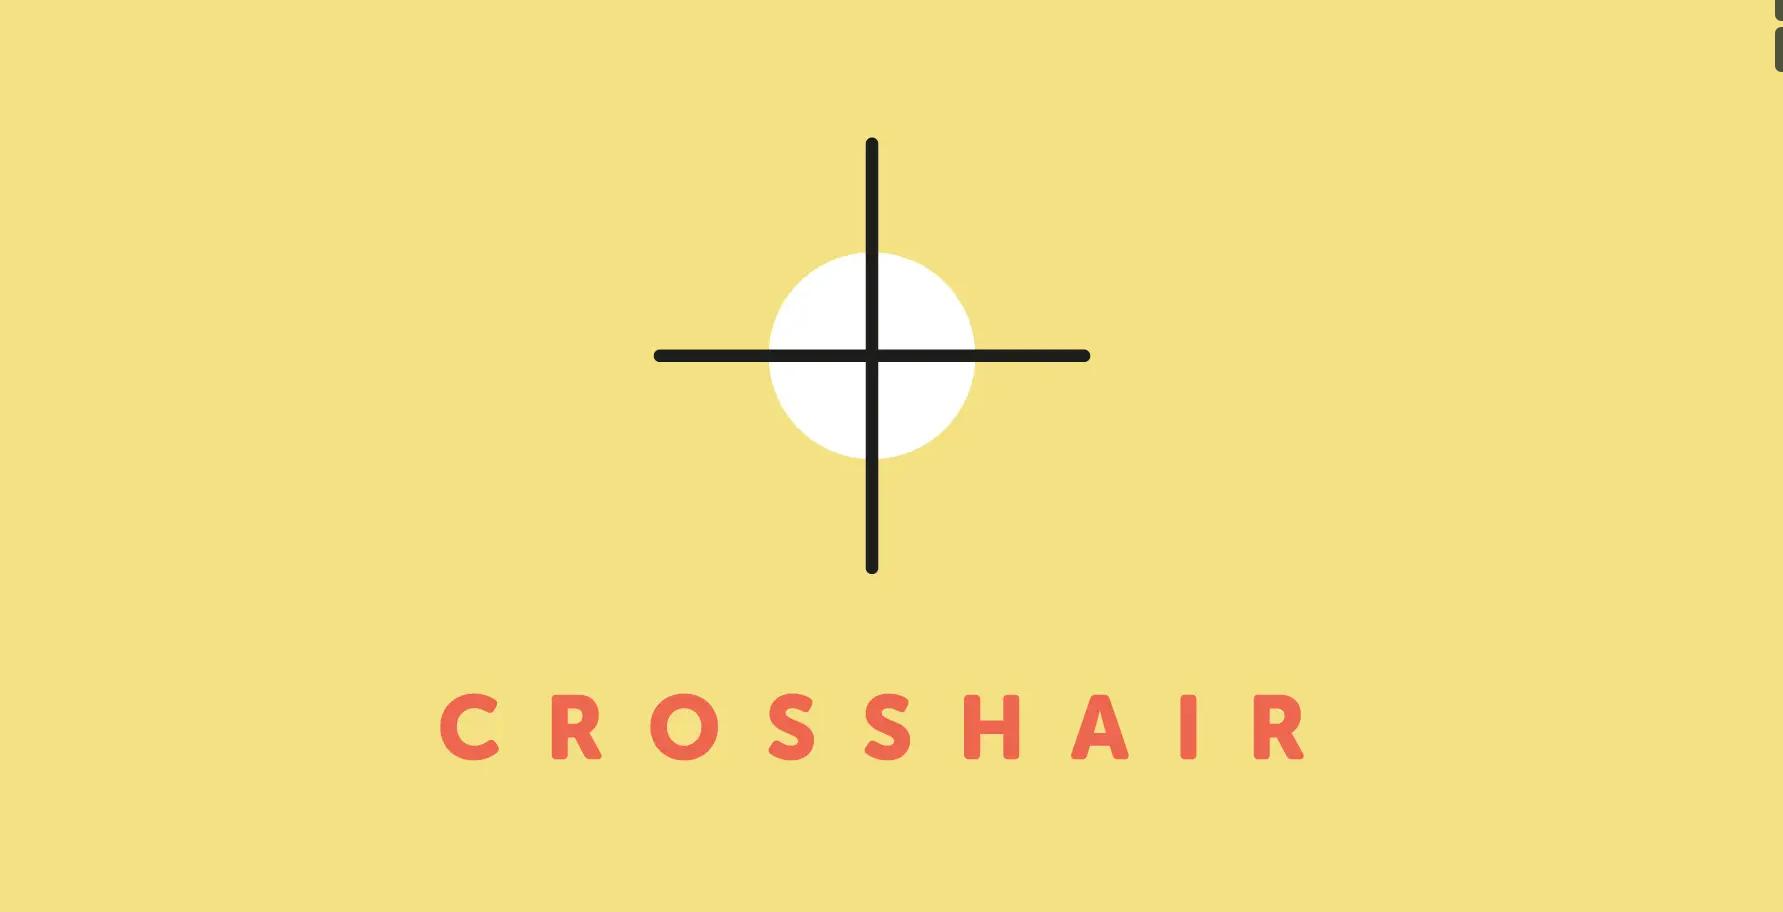 Crosshair - Script, Plugin For After Effect